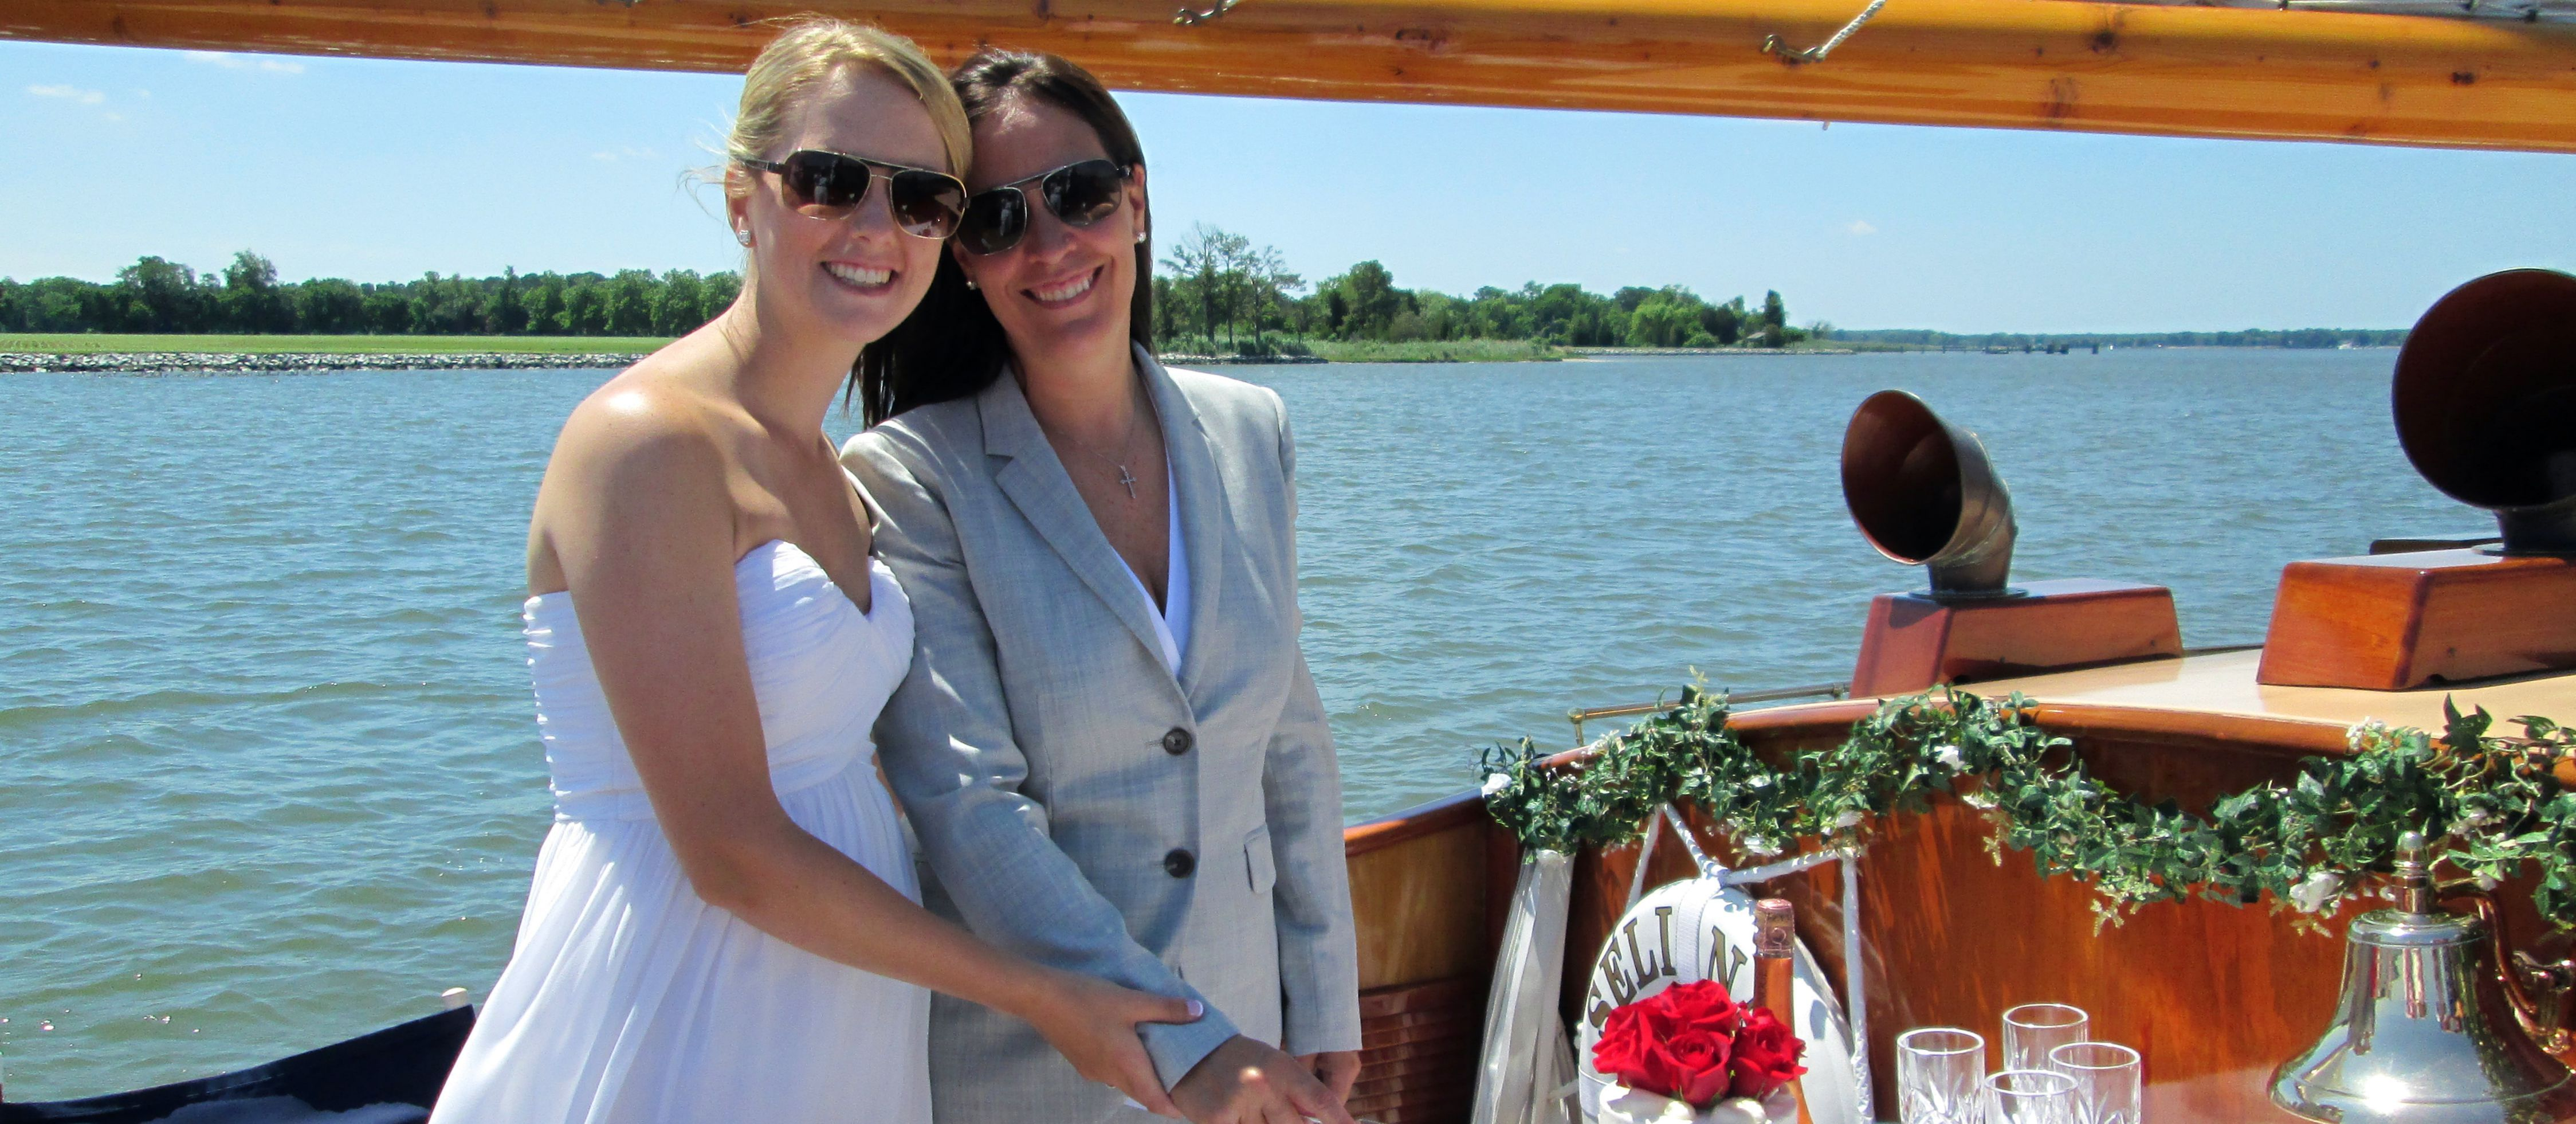 Bay chesapeake lesbian wedding